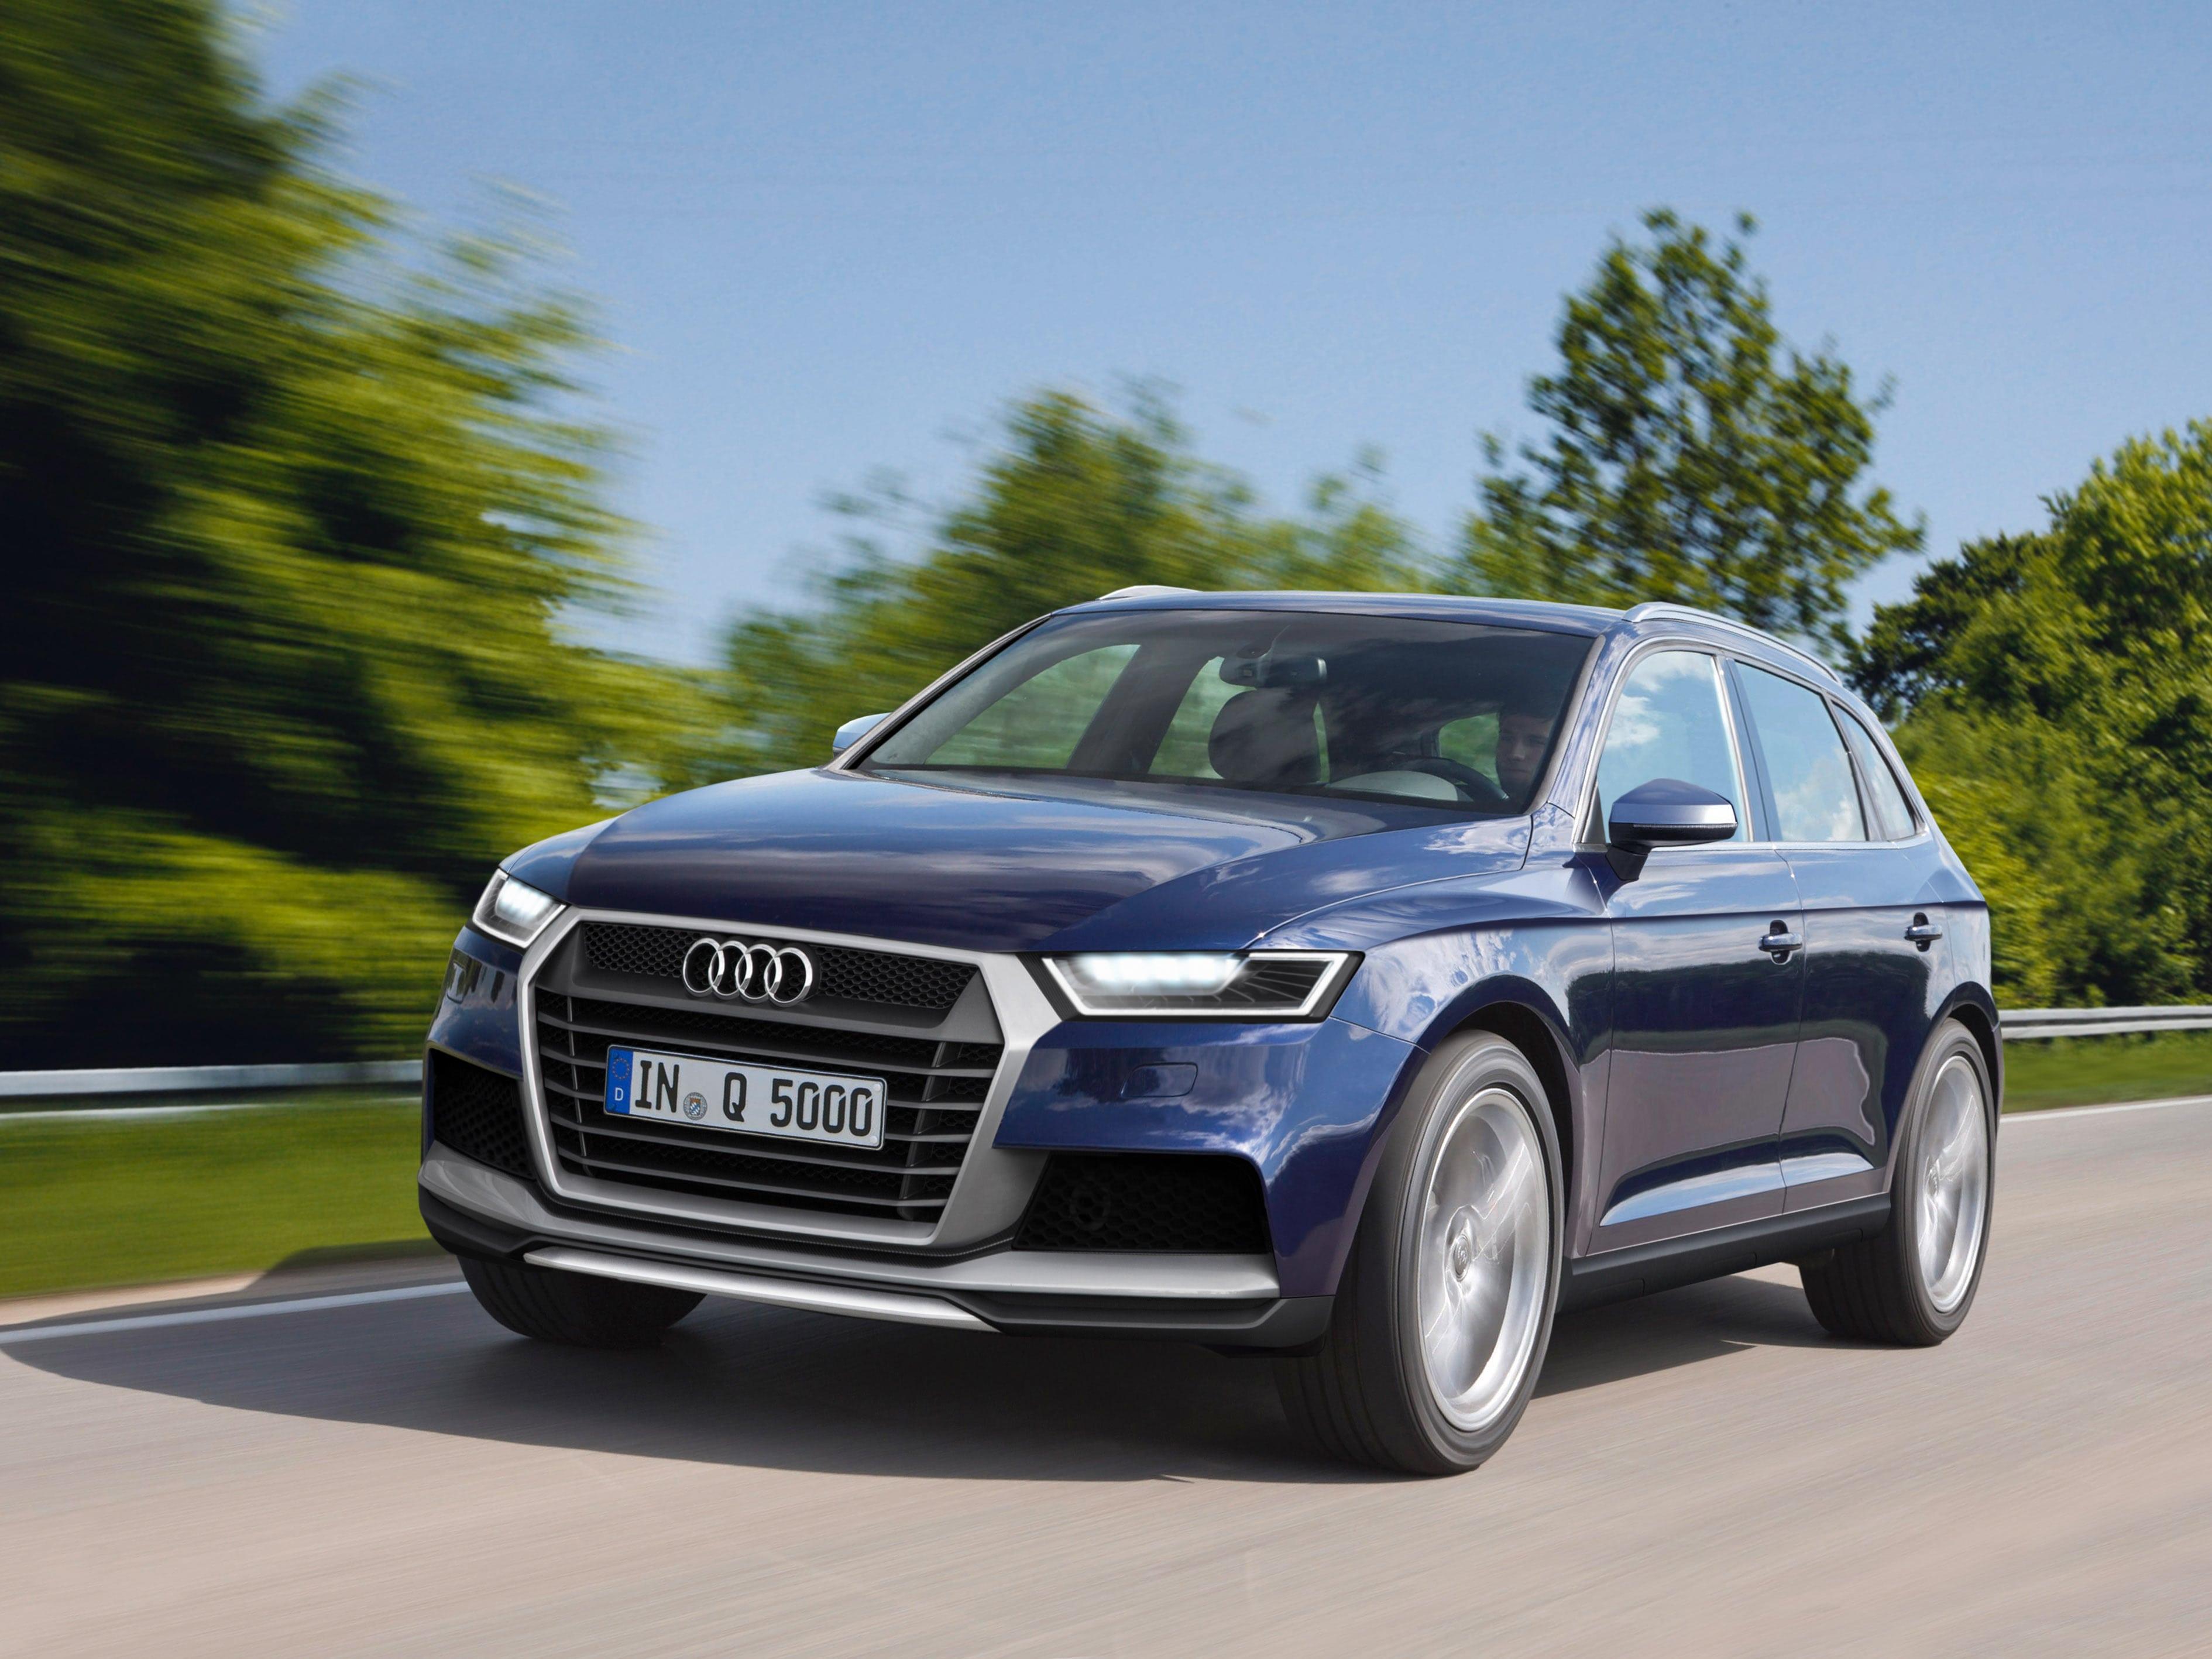 Audi Q5 II HD pictures